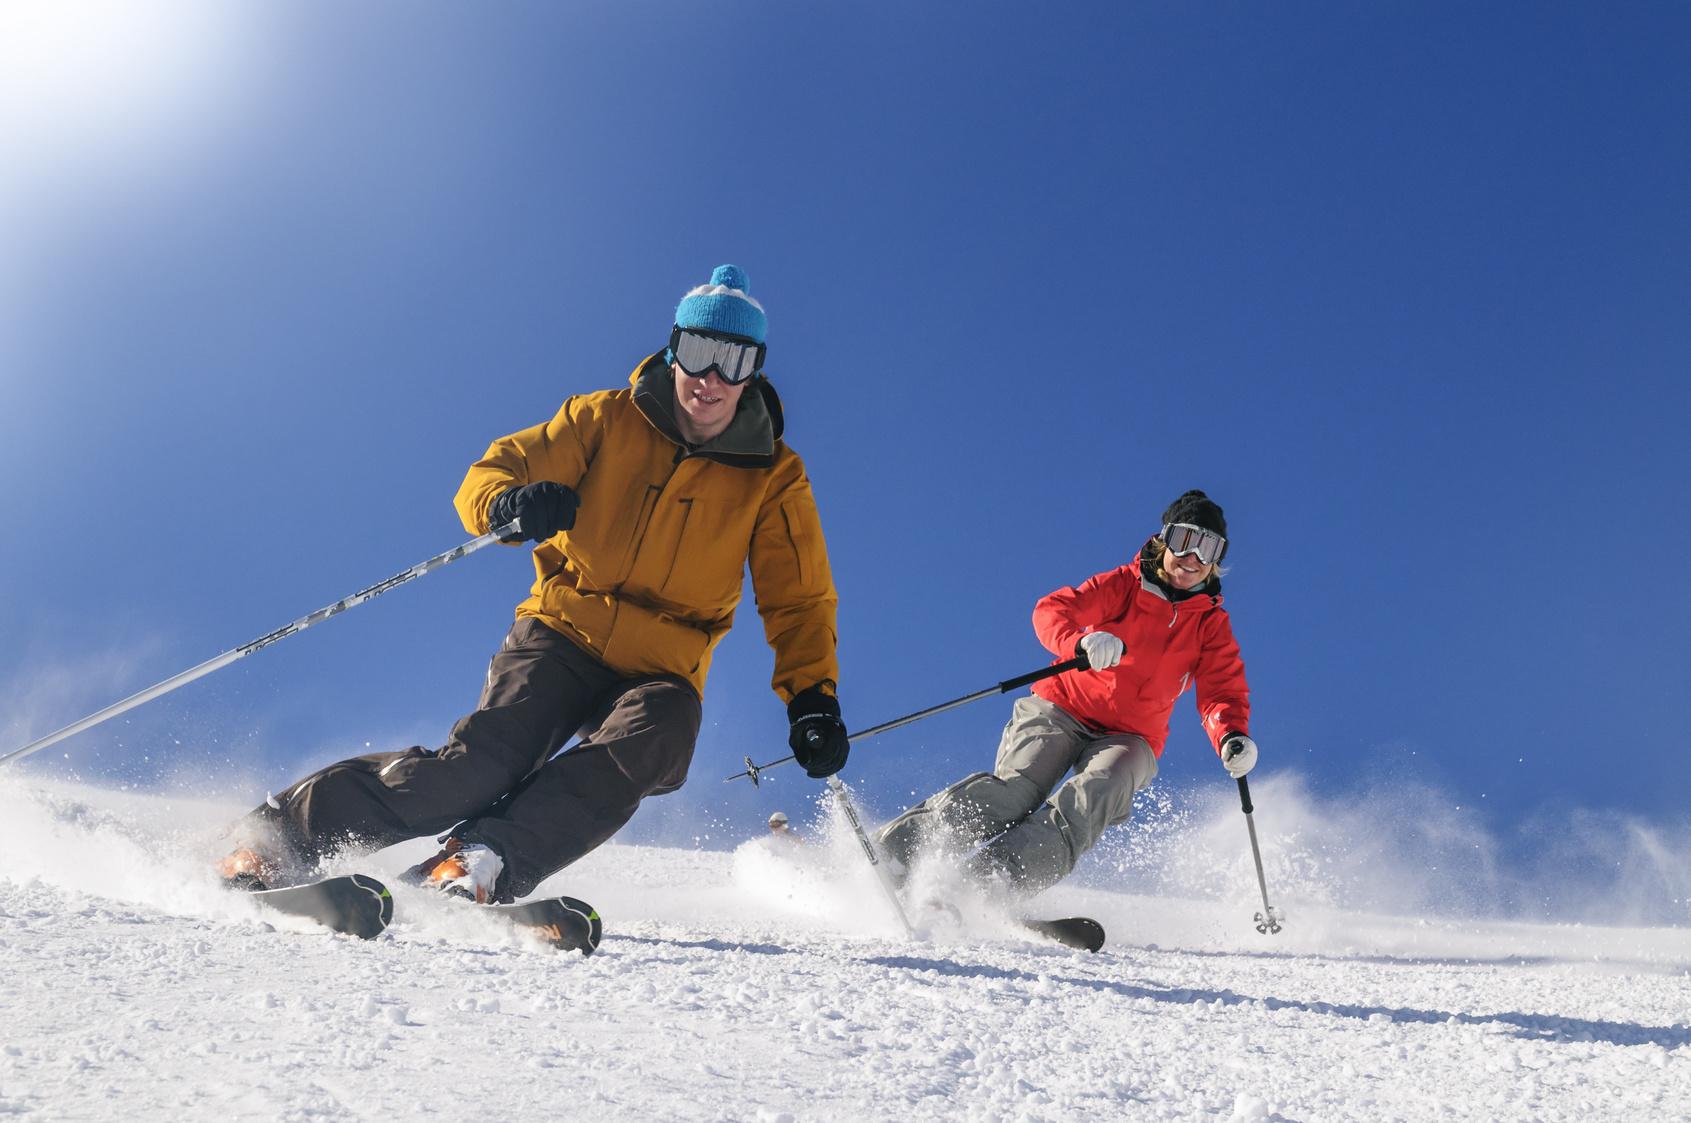 Enjoy two days in the ski paradise Hakuba, Japanese Alps